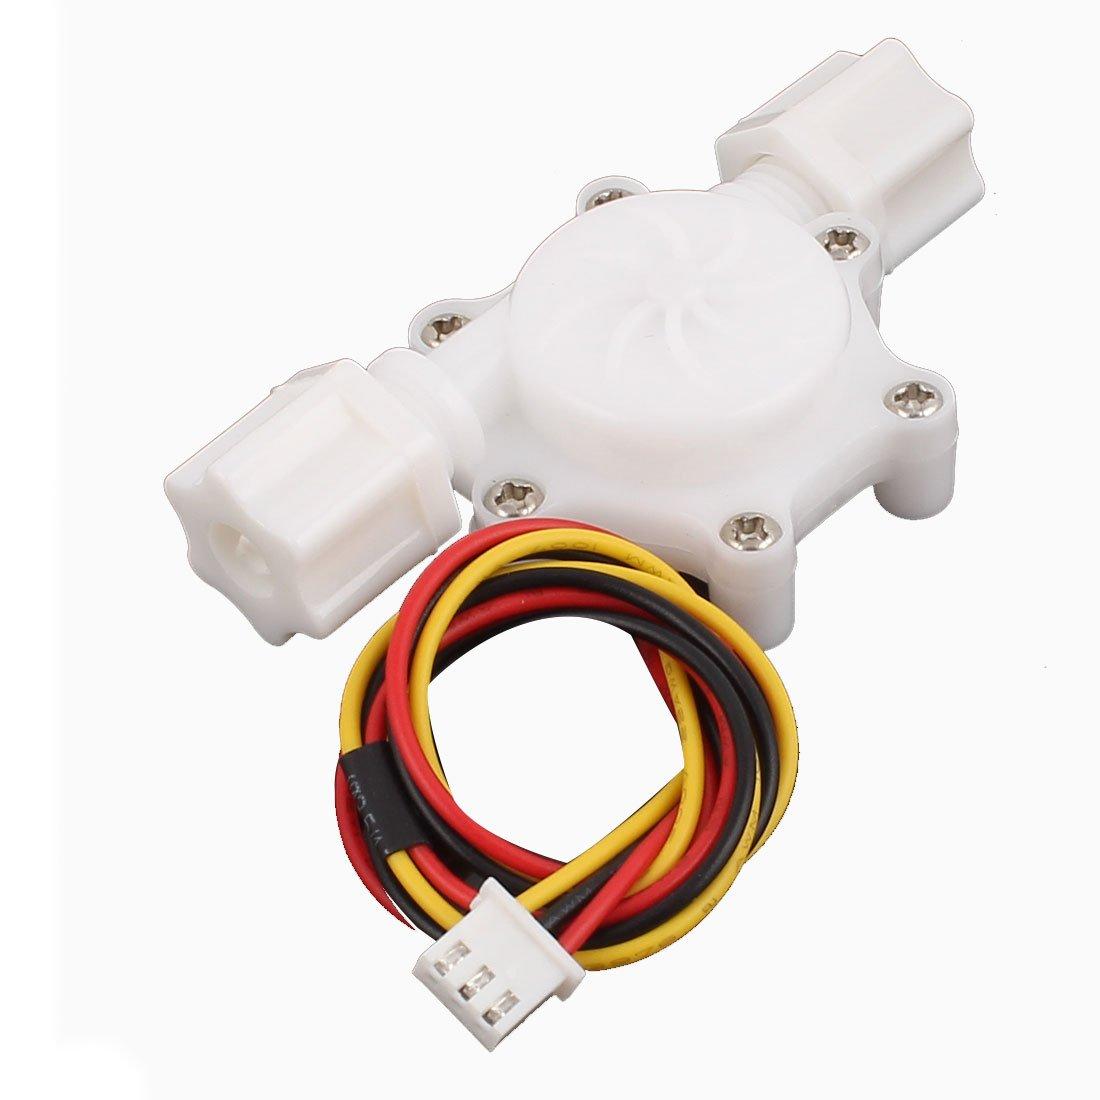 Uxcell SEN-HZ06W Plastic G1/4 Male Thread Water Flow Sensor Flowmeter, 0.15-1.5L/minute